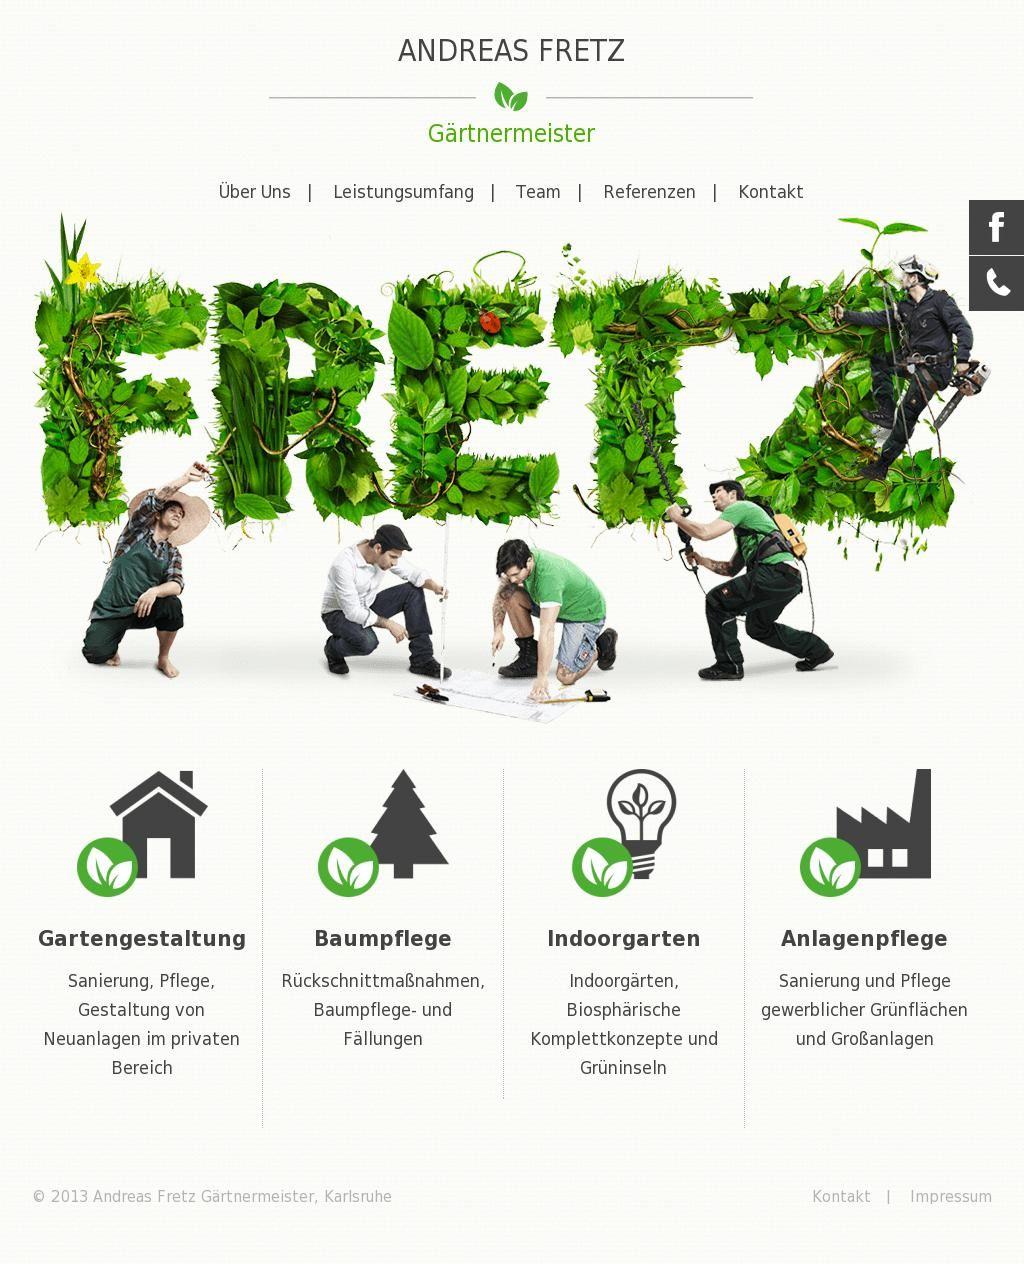 gärtner, gartenbau, landschaftsbau karlsruhe | andreas fretz | web, Garten ideen